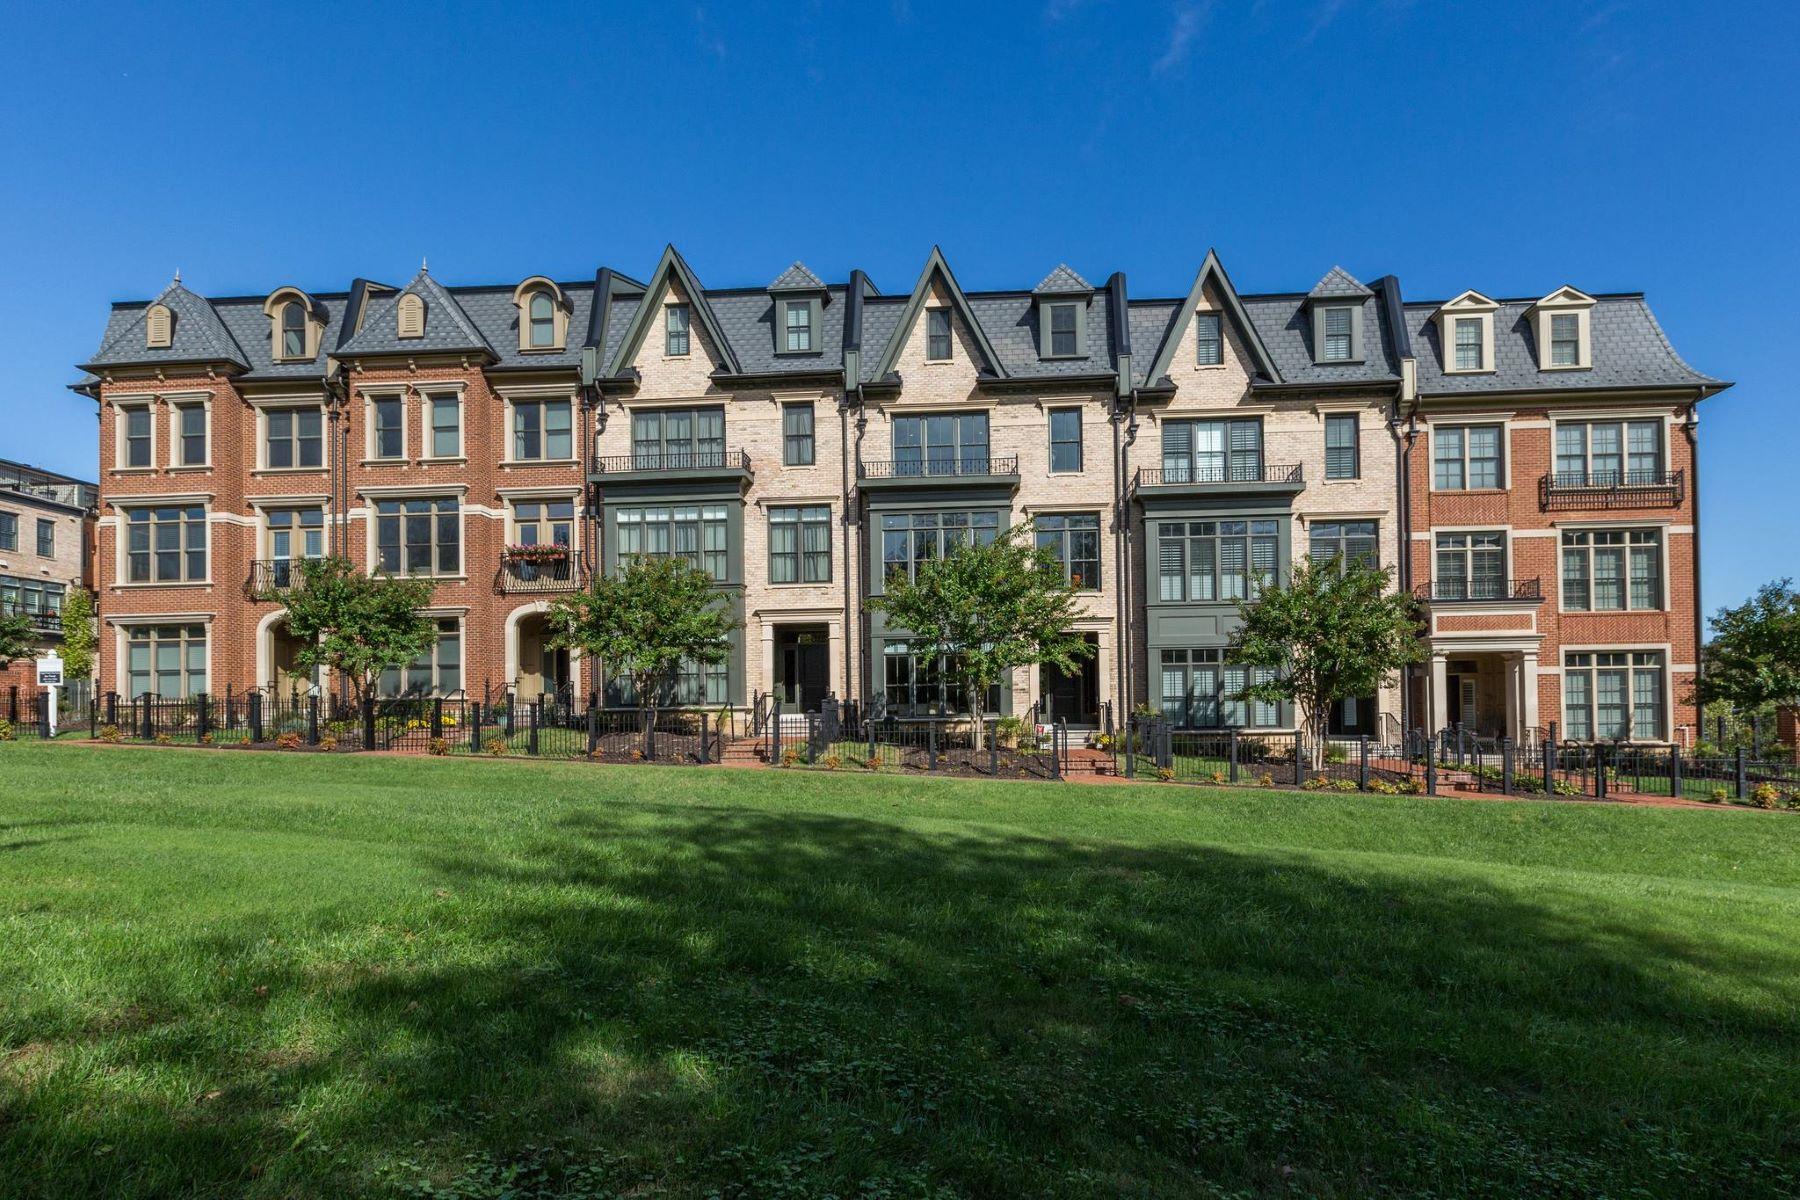 townhouses 为 销售 在 10819 Symphony Park Dr 北贝塞斯达, 马里兰州 20852 美国